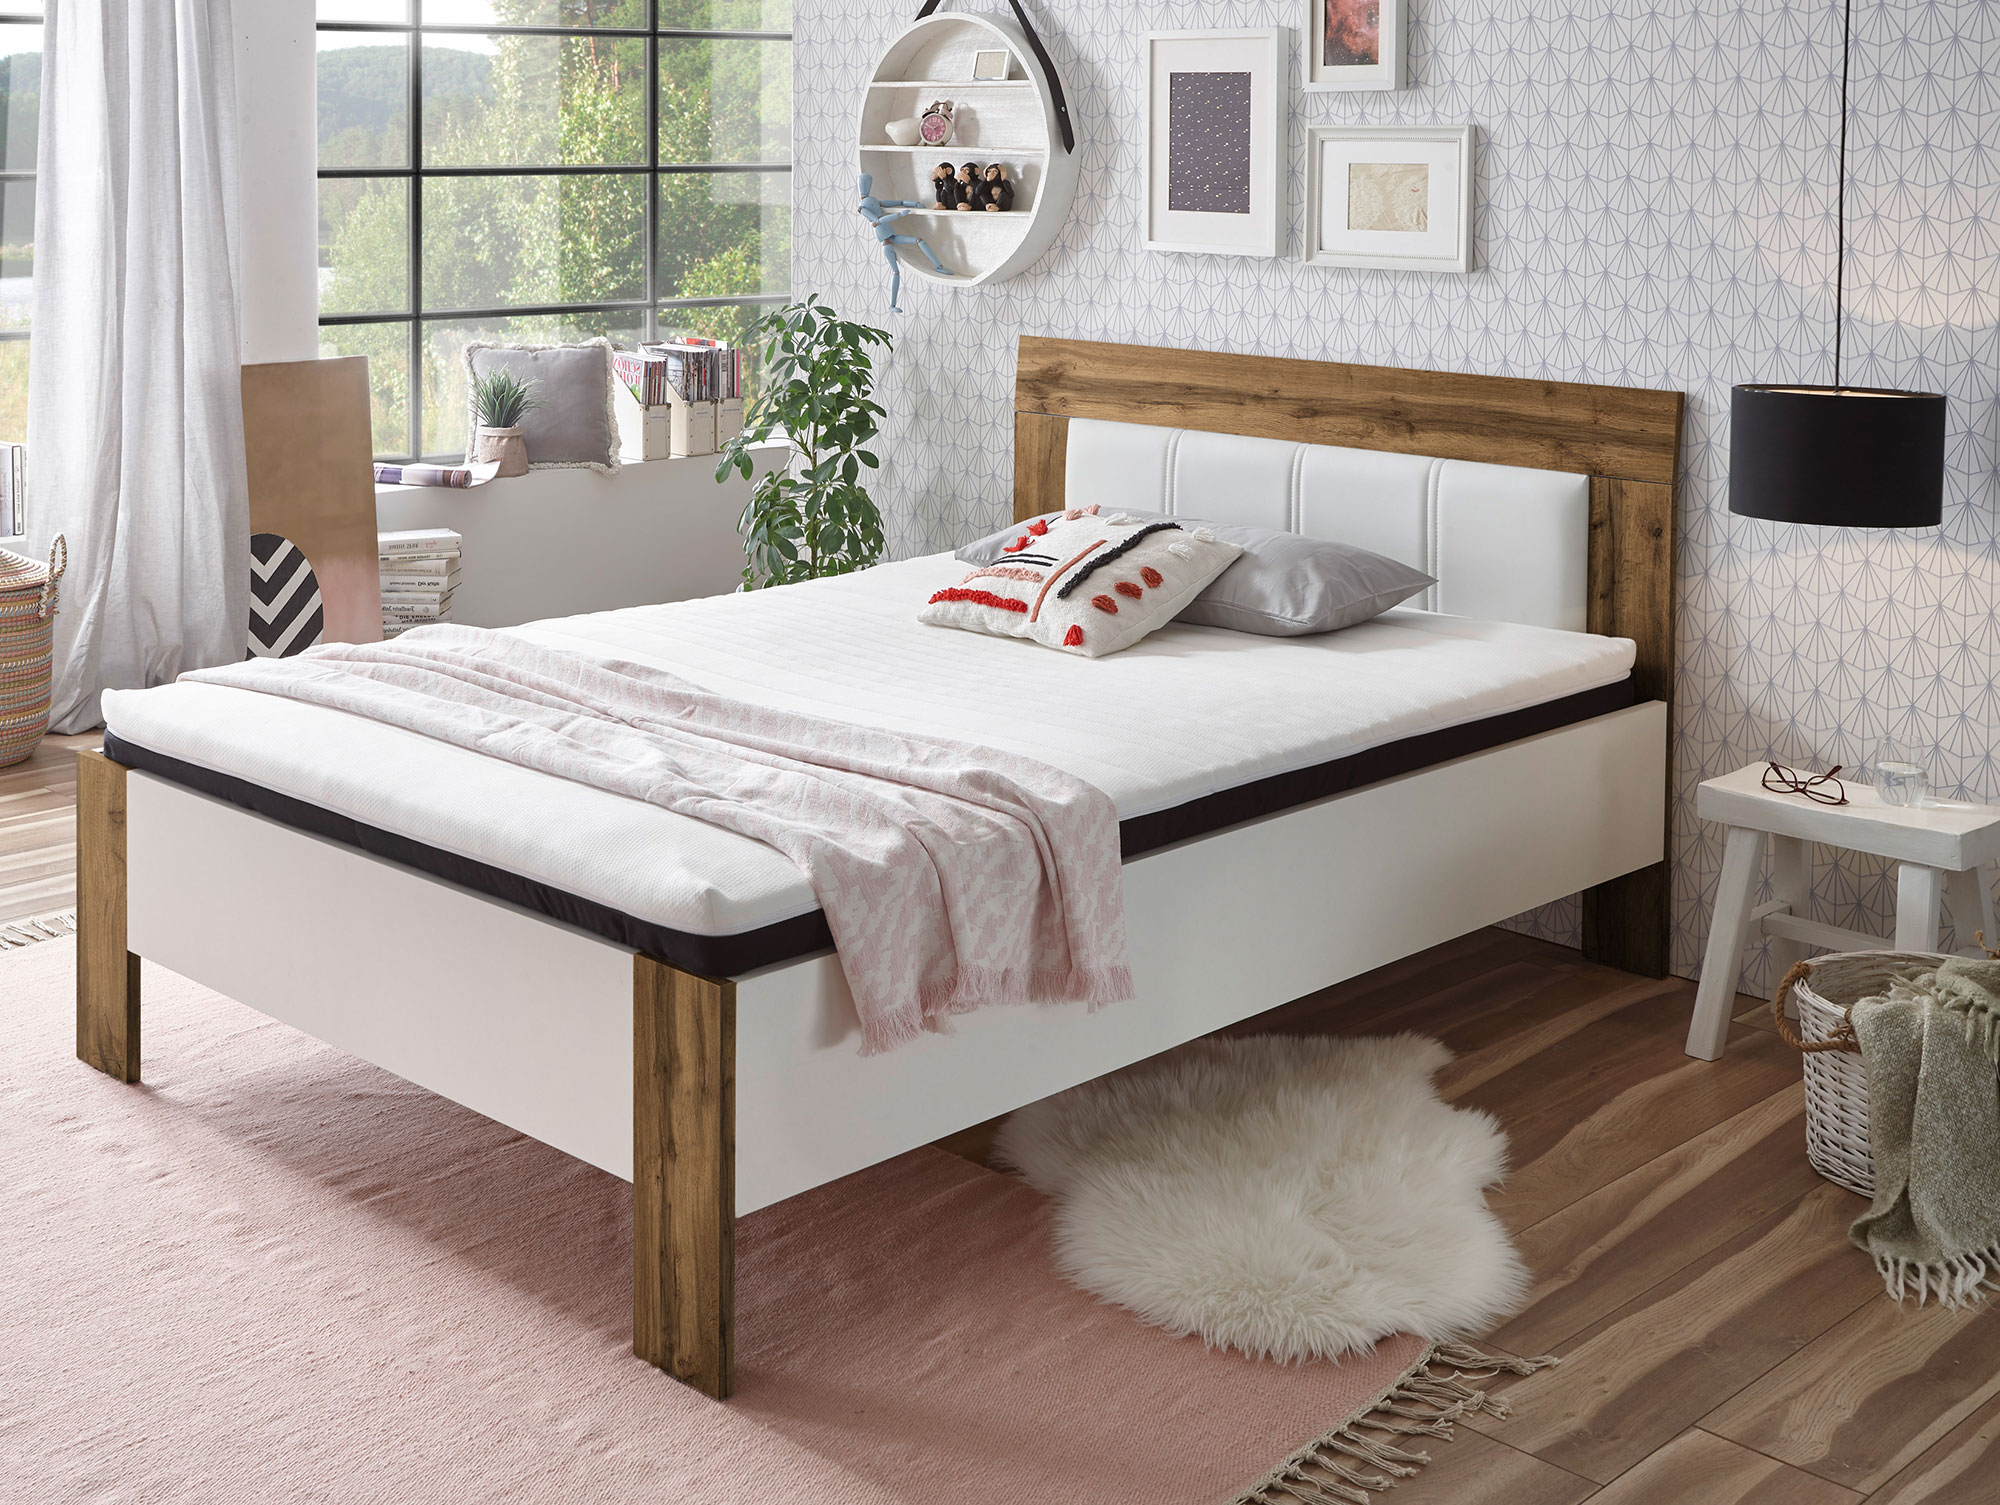 serry bett jugendbett komplett mit matratze und rost. Black Bedroom Furniture Sets. Home Design Ideas